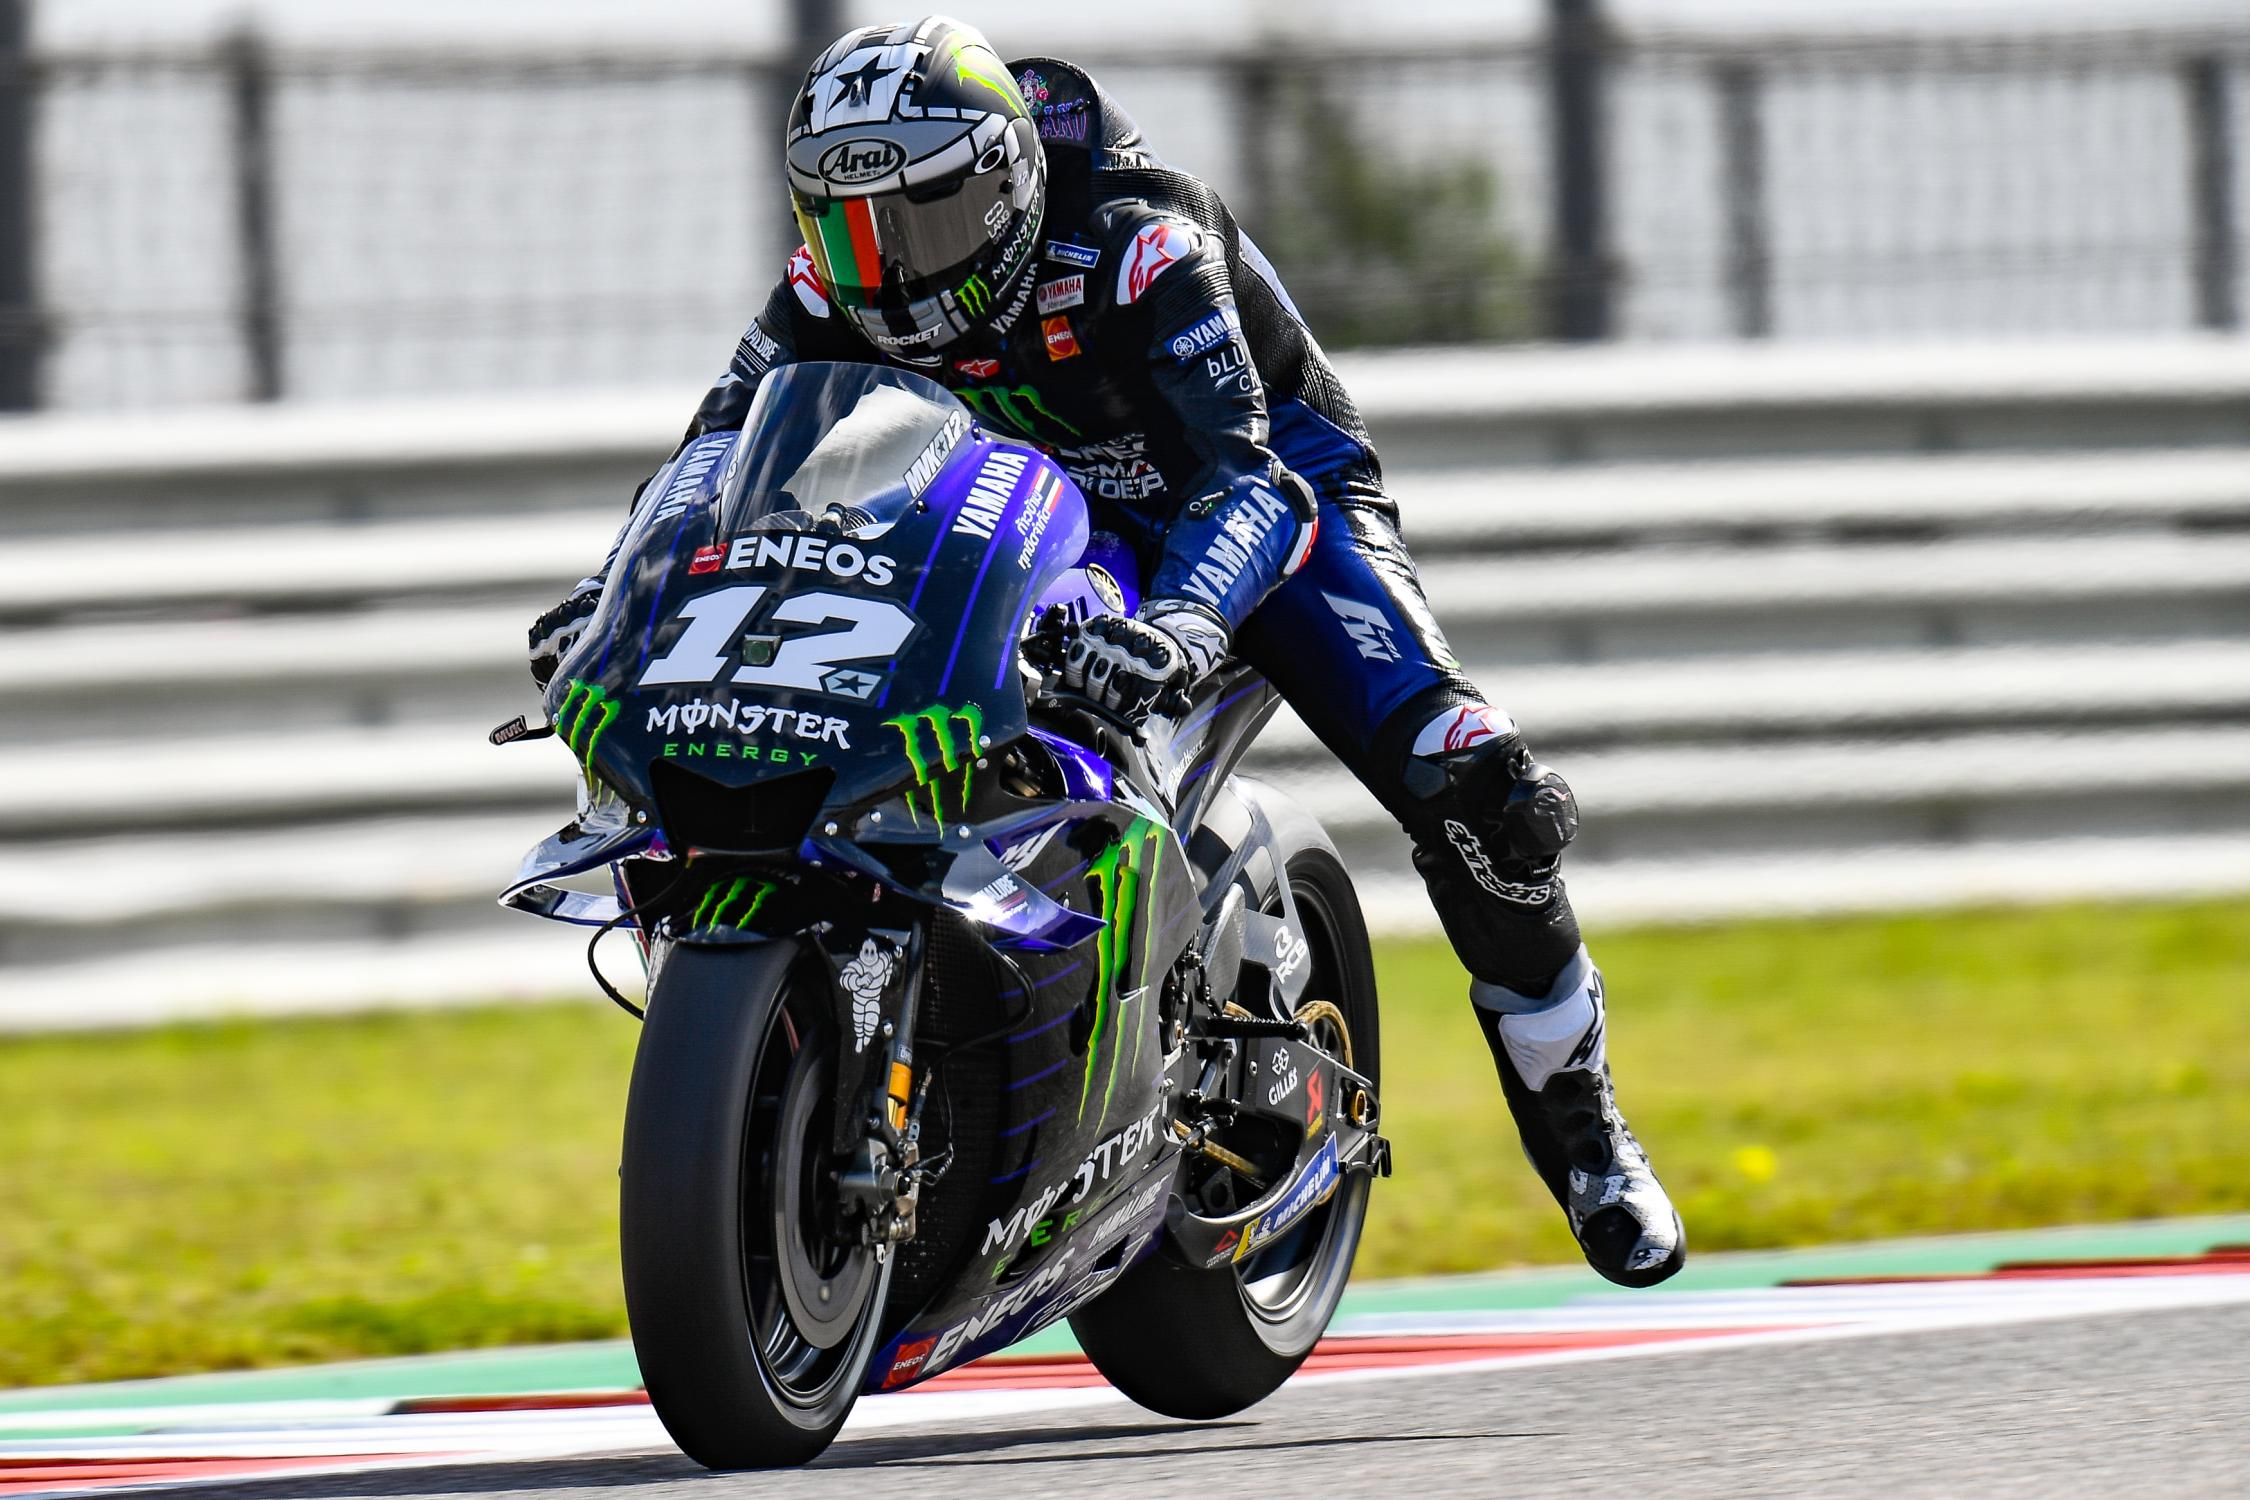 MOTO GP Grand Prix d'Espagne – Jerez  5 mai 2019  Maverick-vinales-austin-motogp-2019-freinage